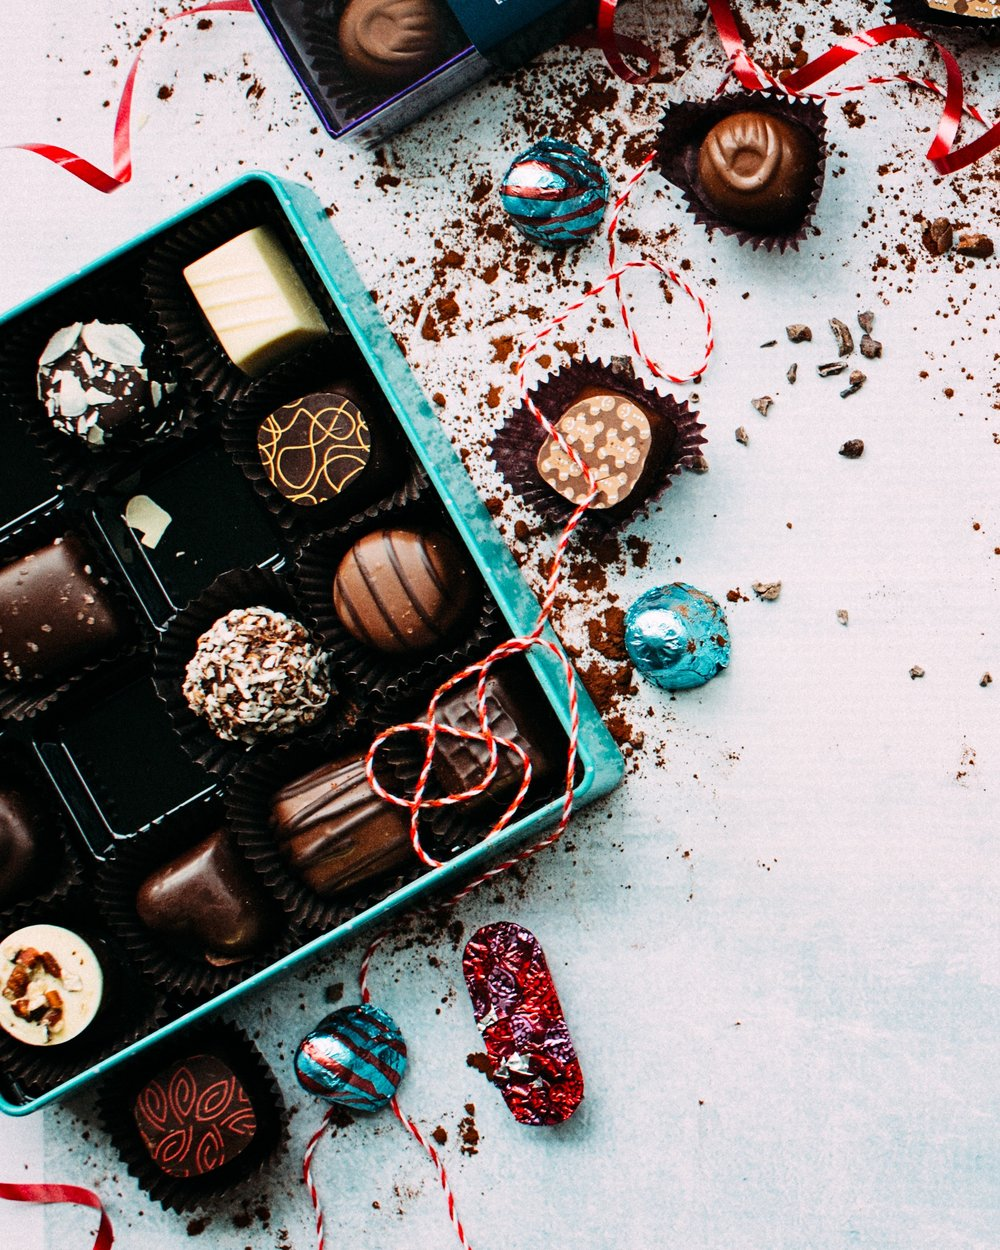 22+Kind+Dessert+Recipes+For+The+Holidays+Post.jpg